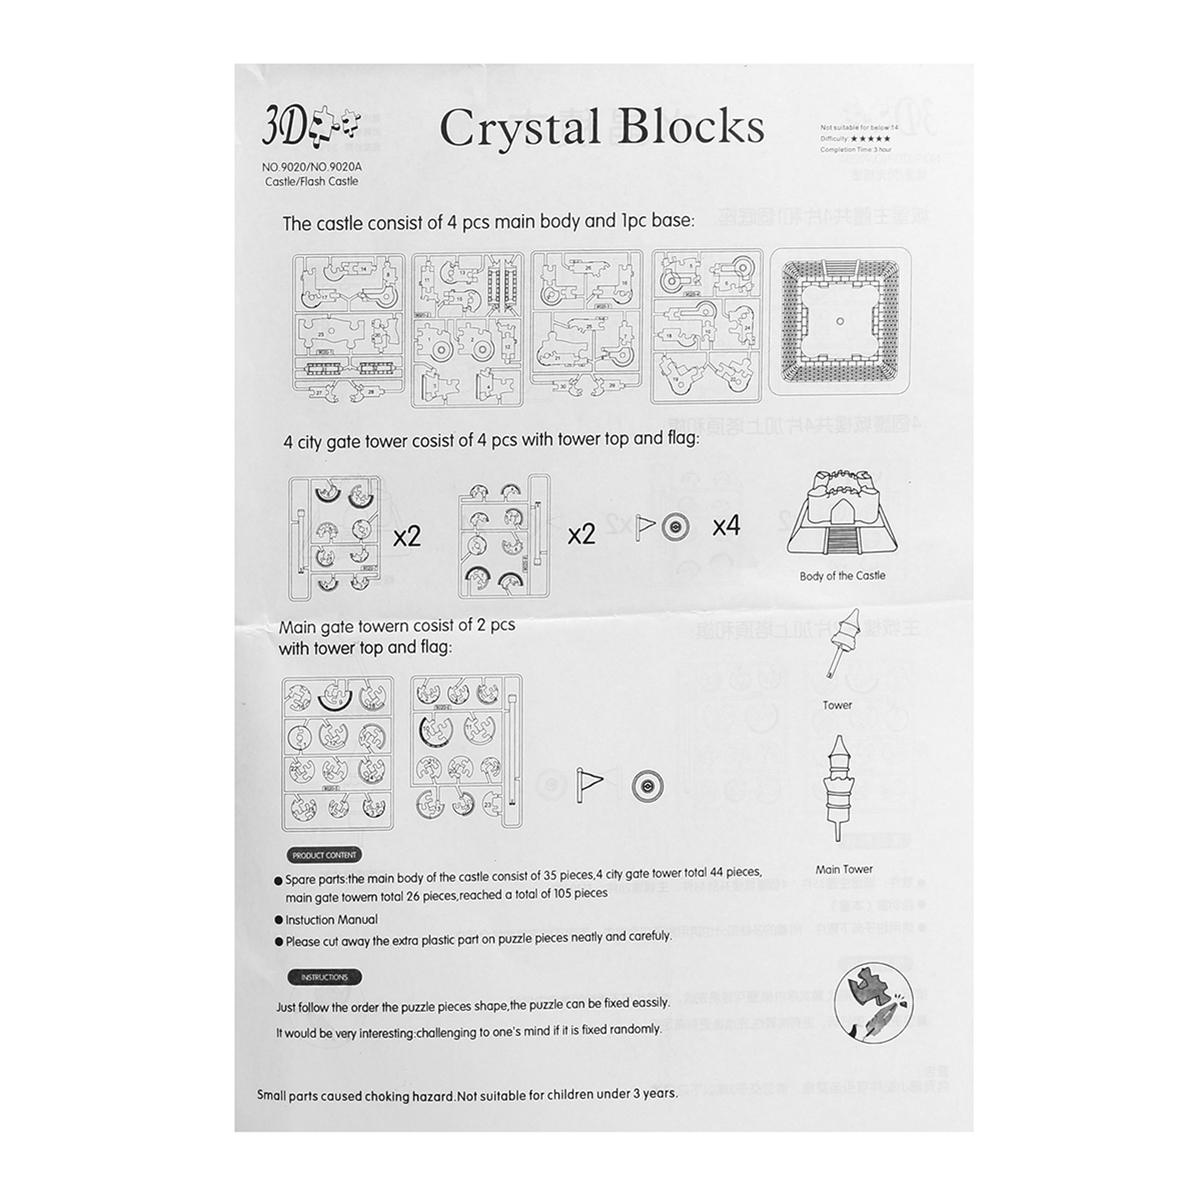 original 3d crystal puzzle ship instructions